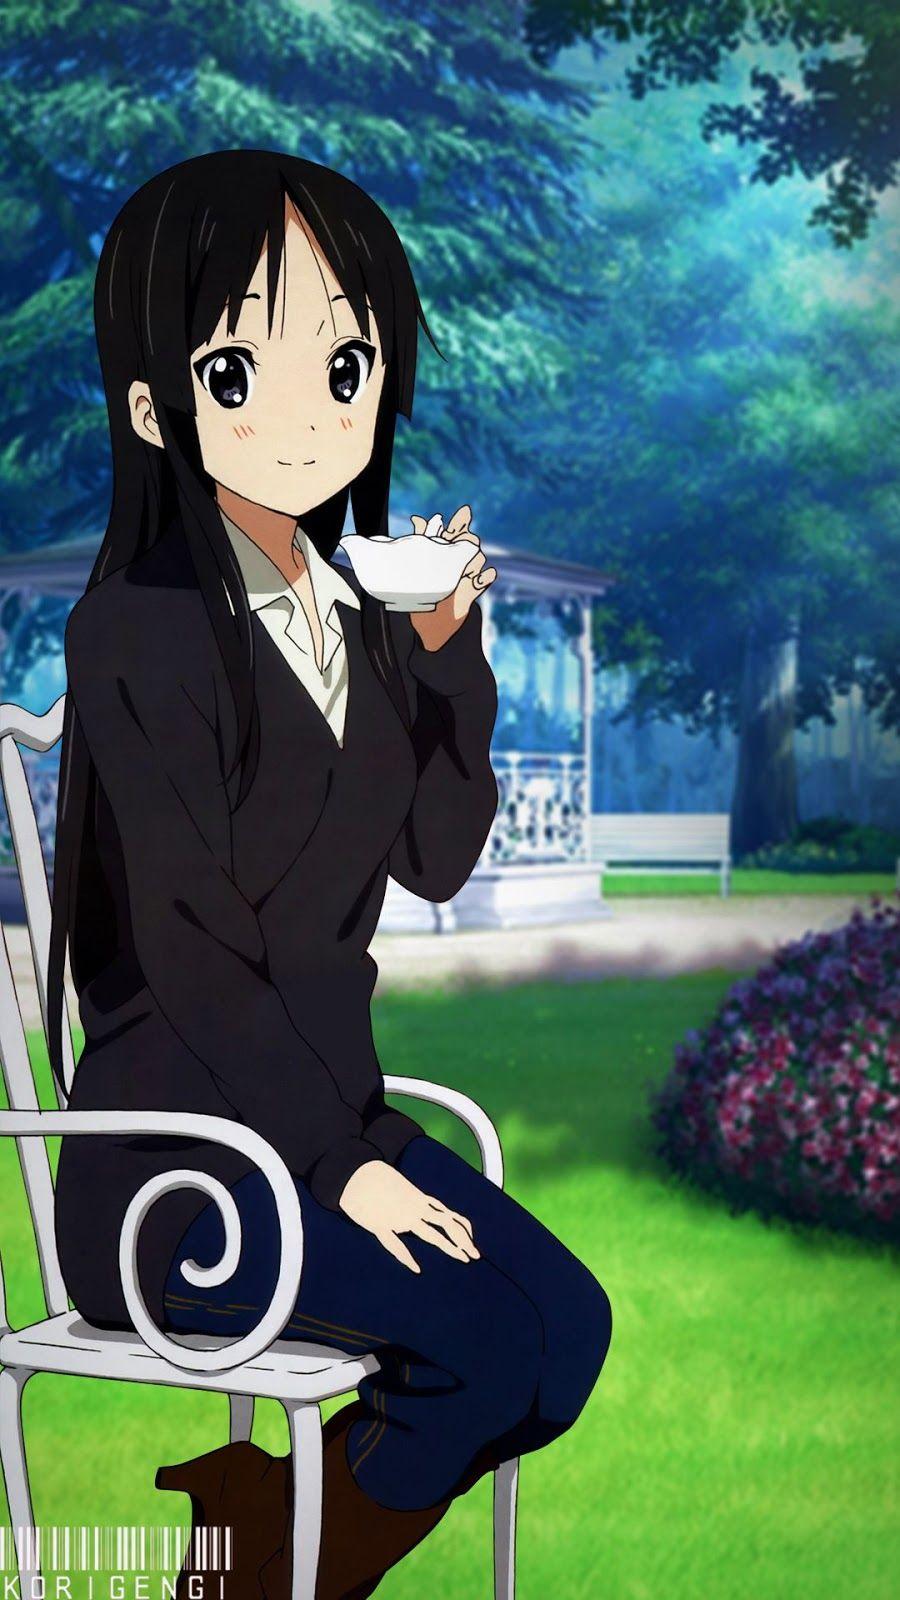 Akiyama Mio V4 Wallpaper Anime Anime Estetika Cinta Anime Akiyama mio k on wallpaper